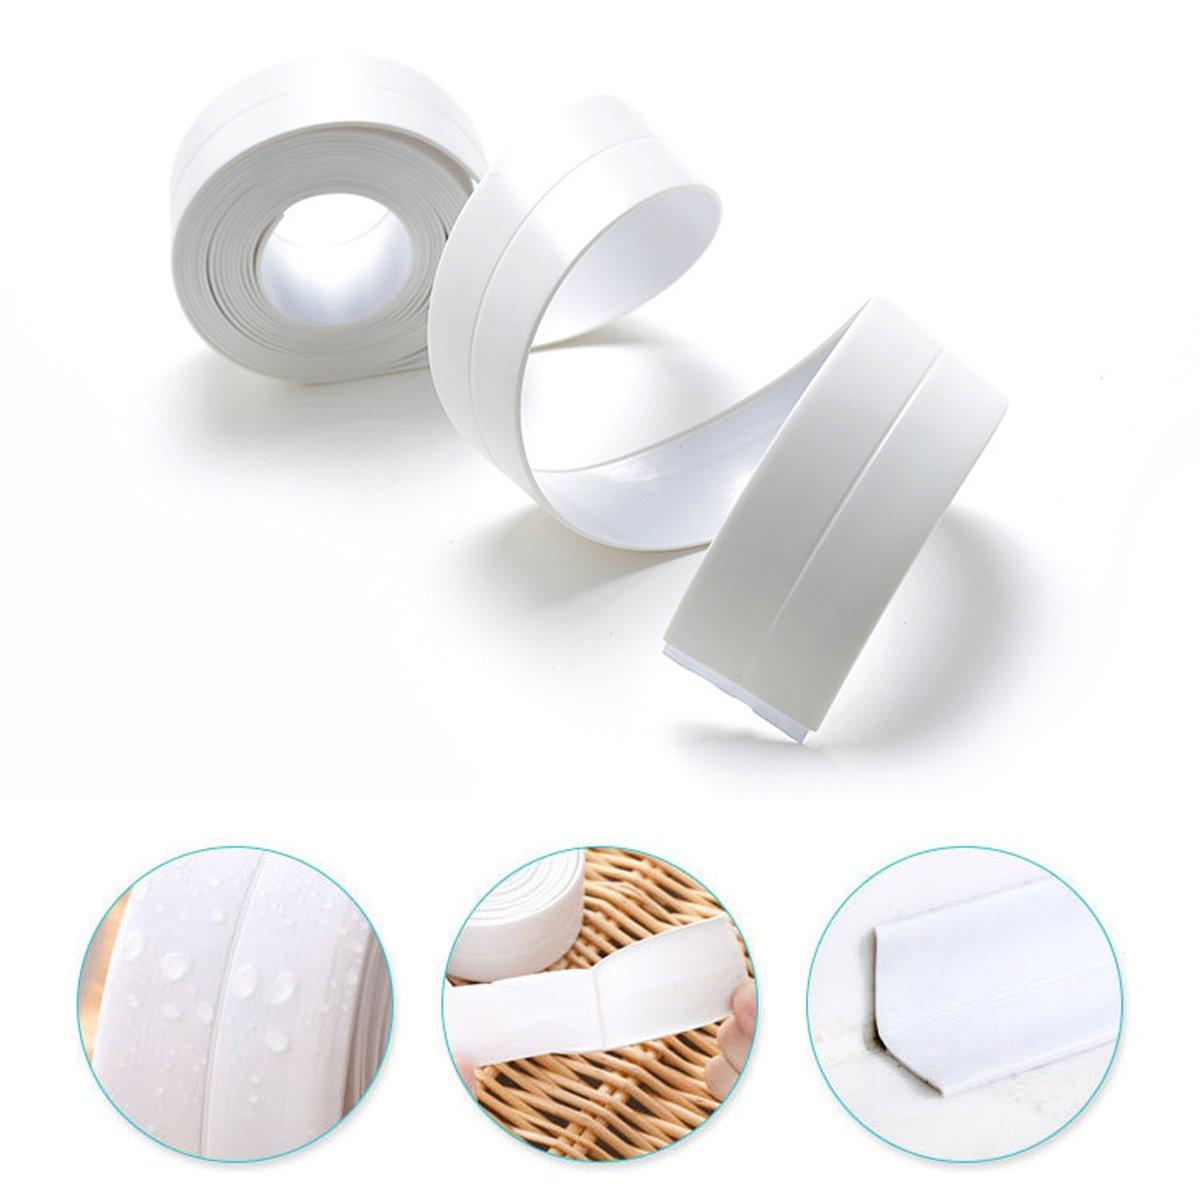 Corner Line Tape Strip Waterproof Mildew Proof Kitchen Bathtube Wall Edge Protector (126x0.87) 2 Pcs RL